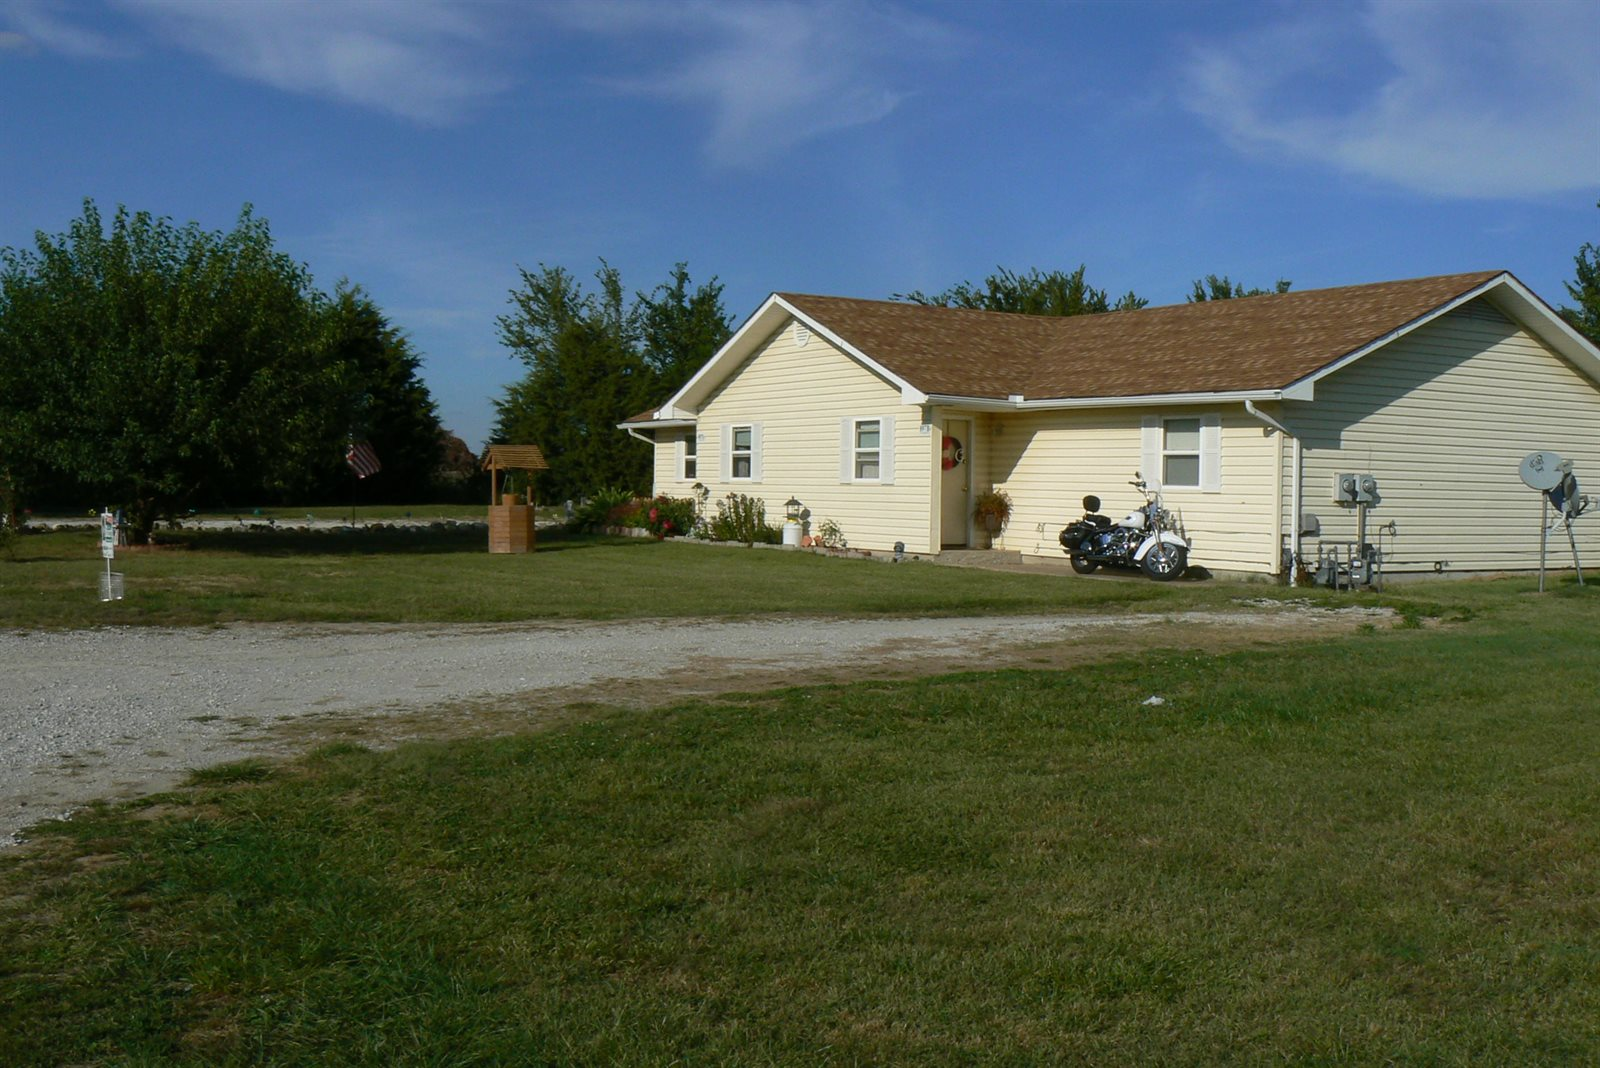 839-897 Sunny Slope Lane, Joplin, MO 64804